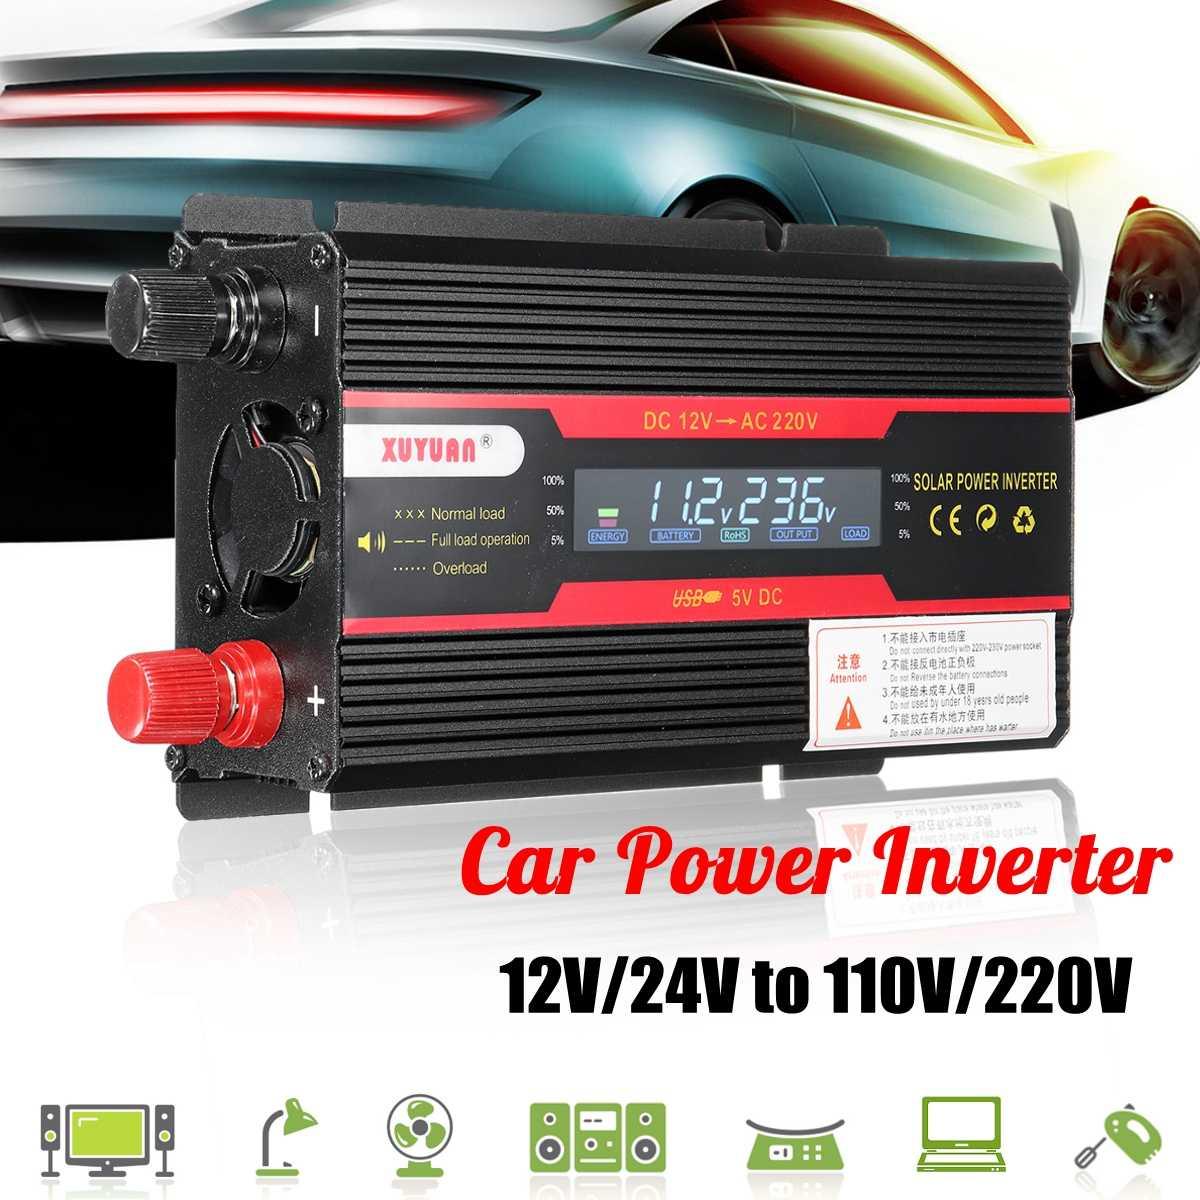 Car Inverter 12V 220V 3000W Power Inverter Voltage Convertor Transformer 12V/24V To 110V/220V Inversor + LCD Display